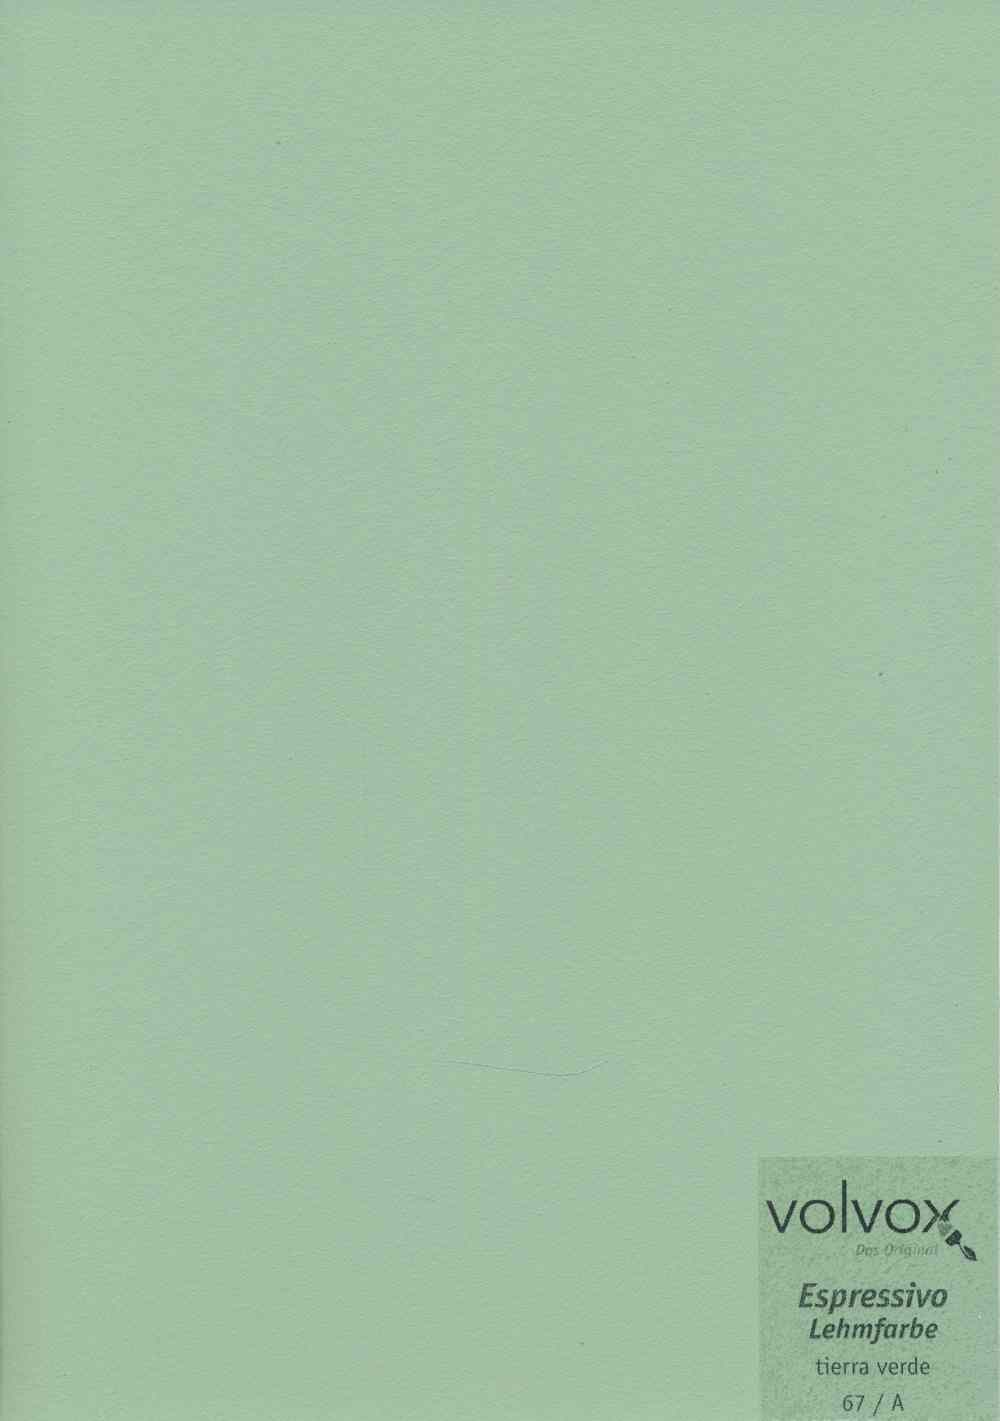 Volvox Espressivo Lehmfarbe 067 tierra verde